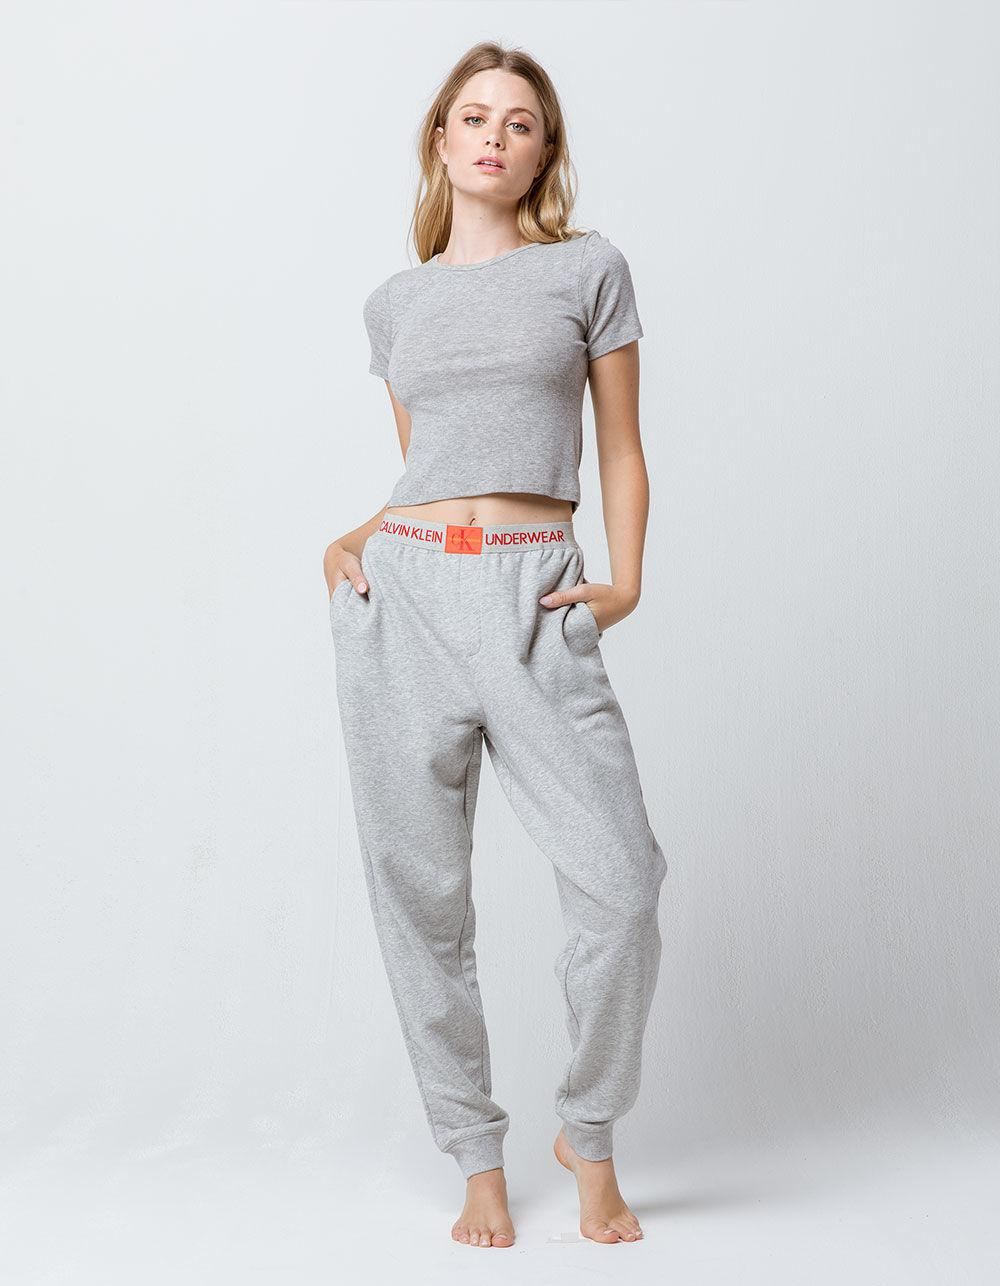 Lyst - Calvin Klein Monogram Logo Heather Gray Womens Jogger Pants ... 04ce490ff